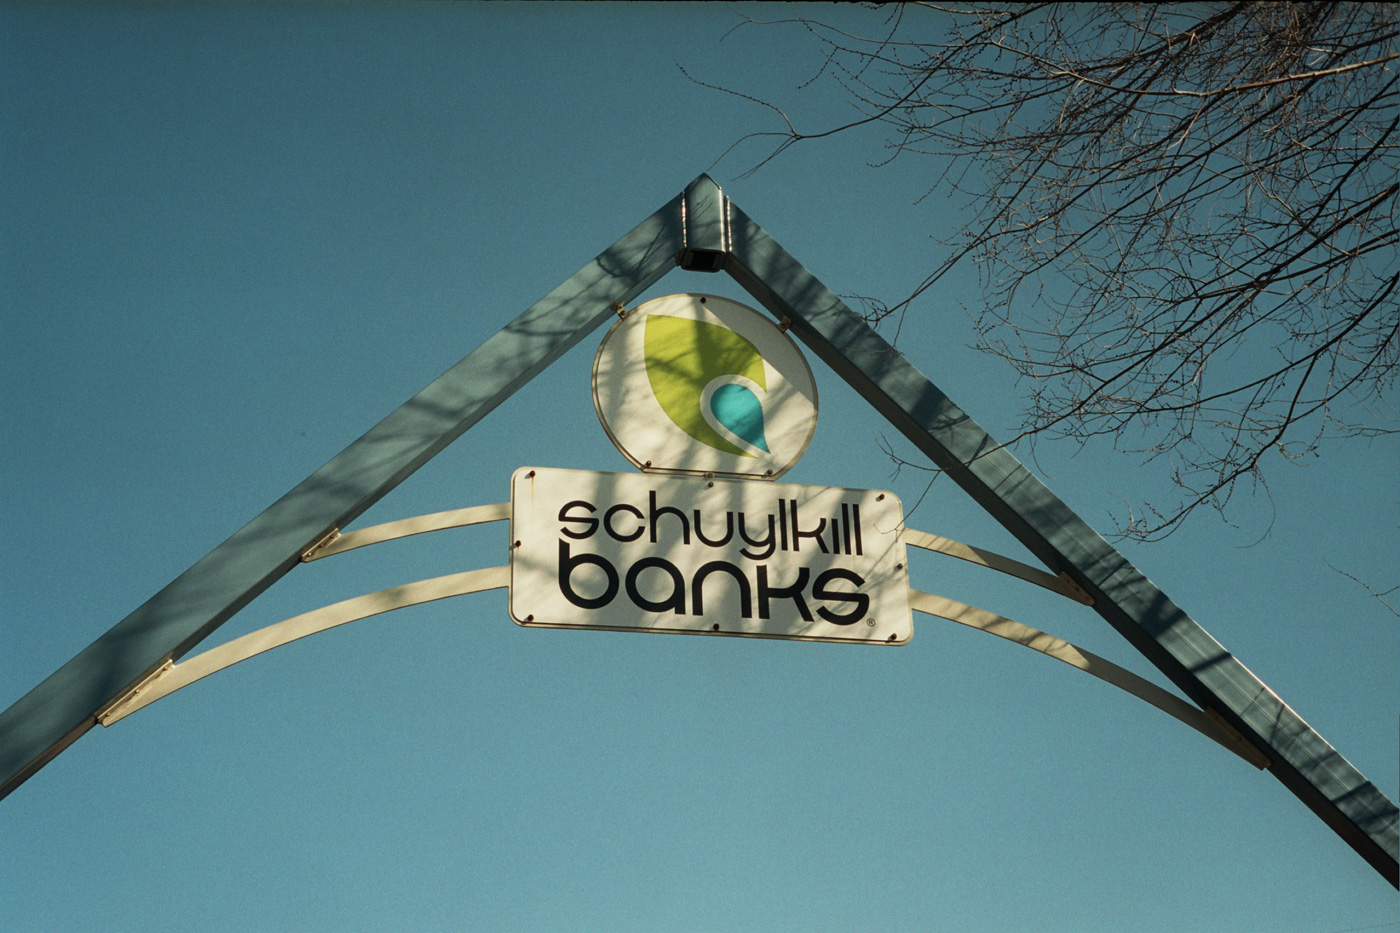 Schuylkill Banks